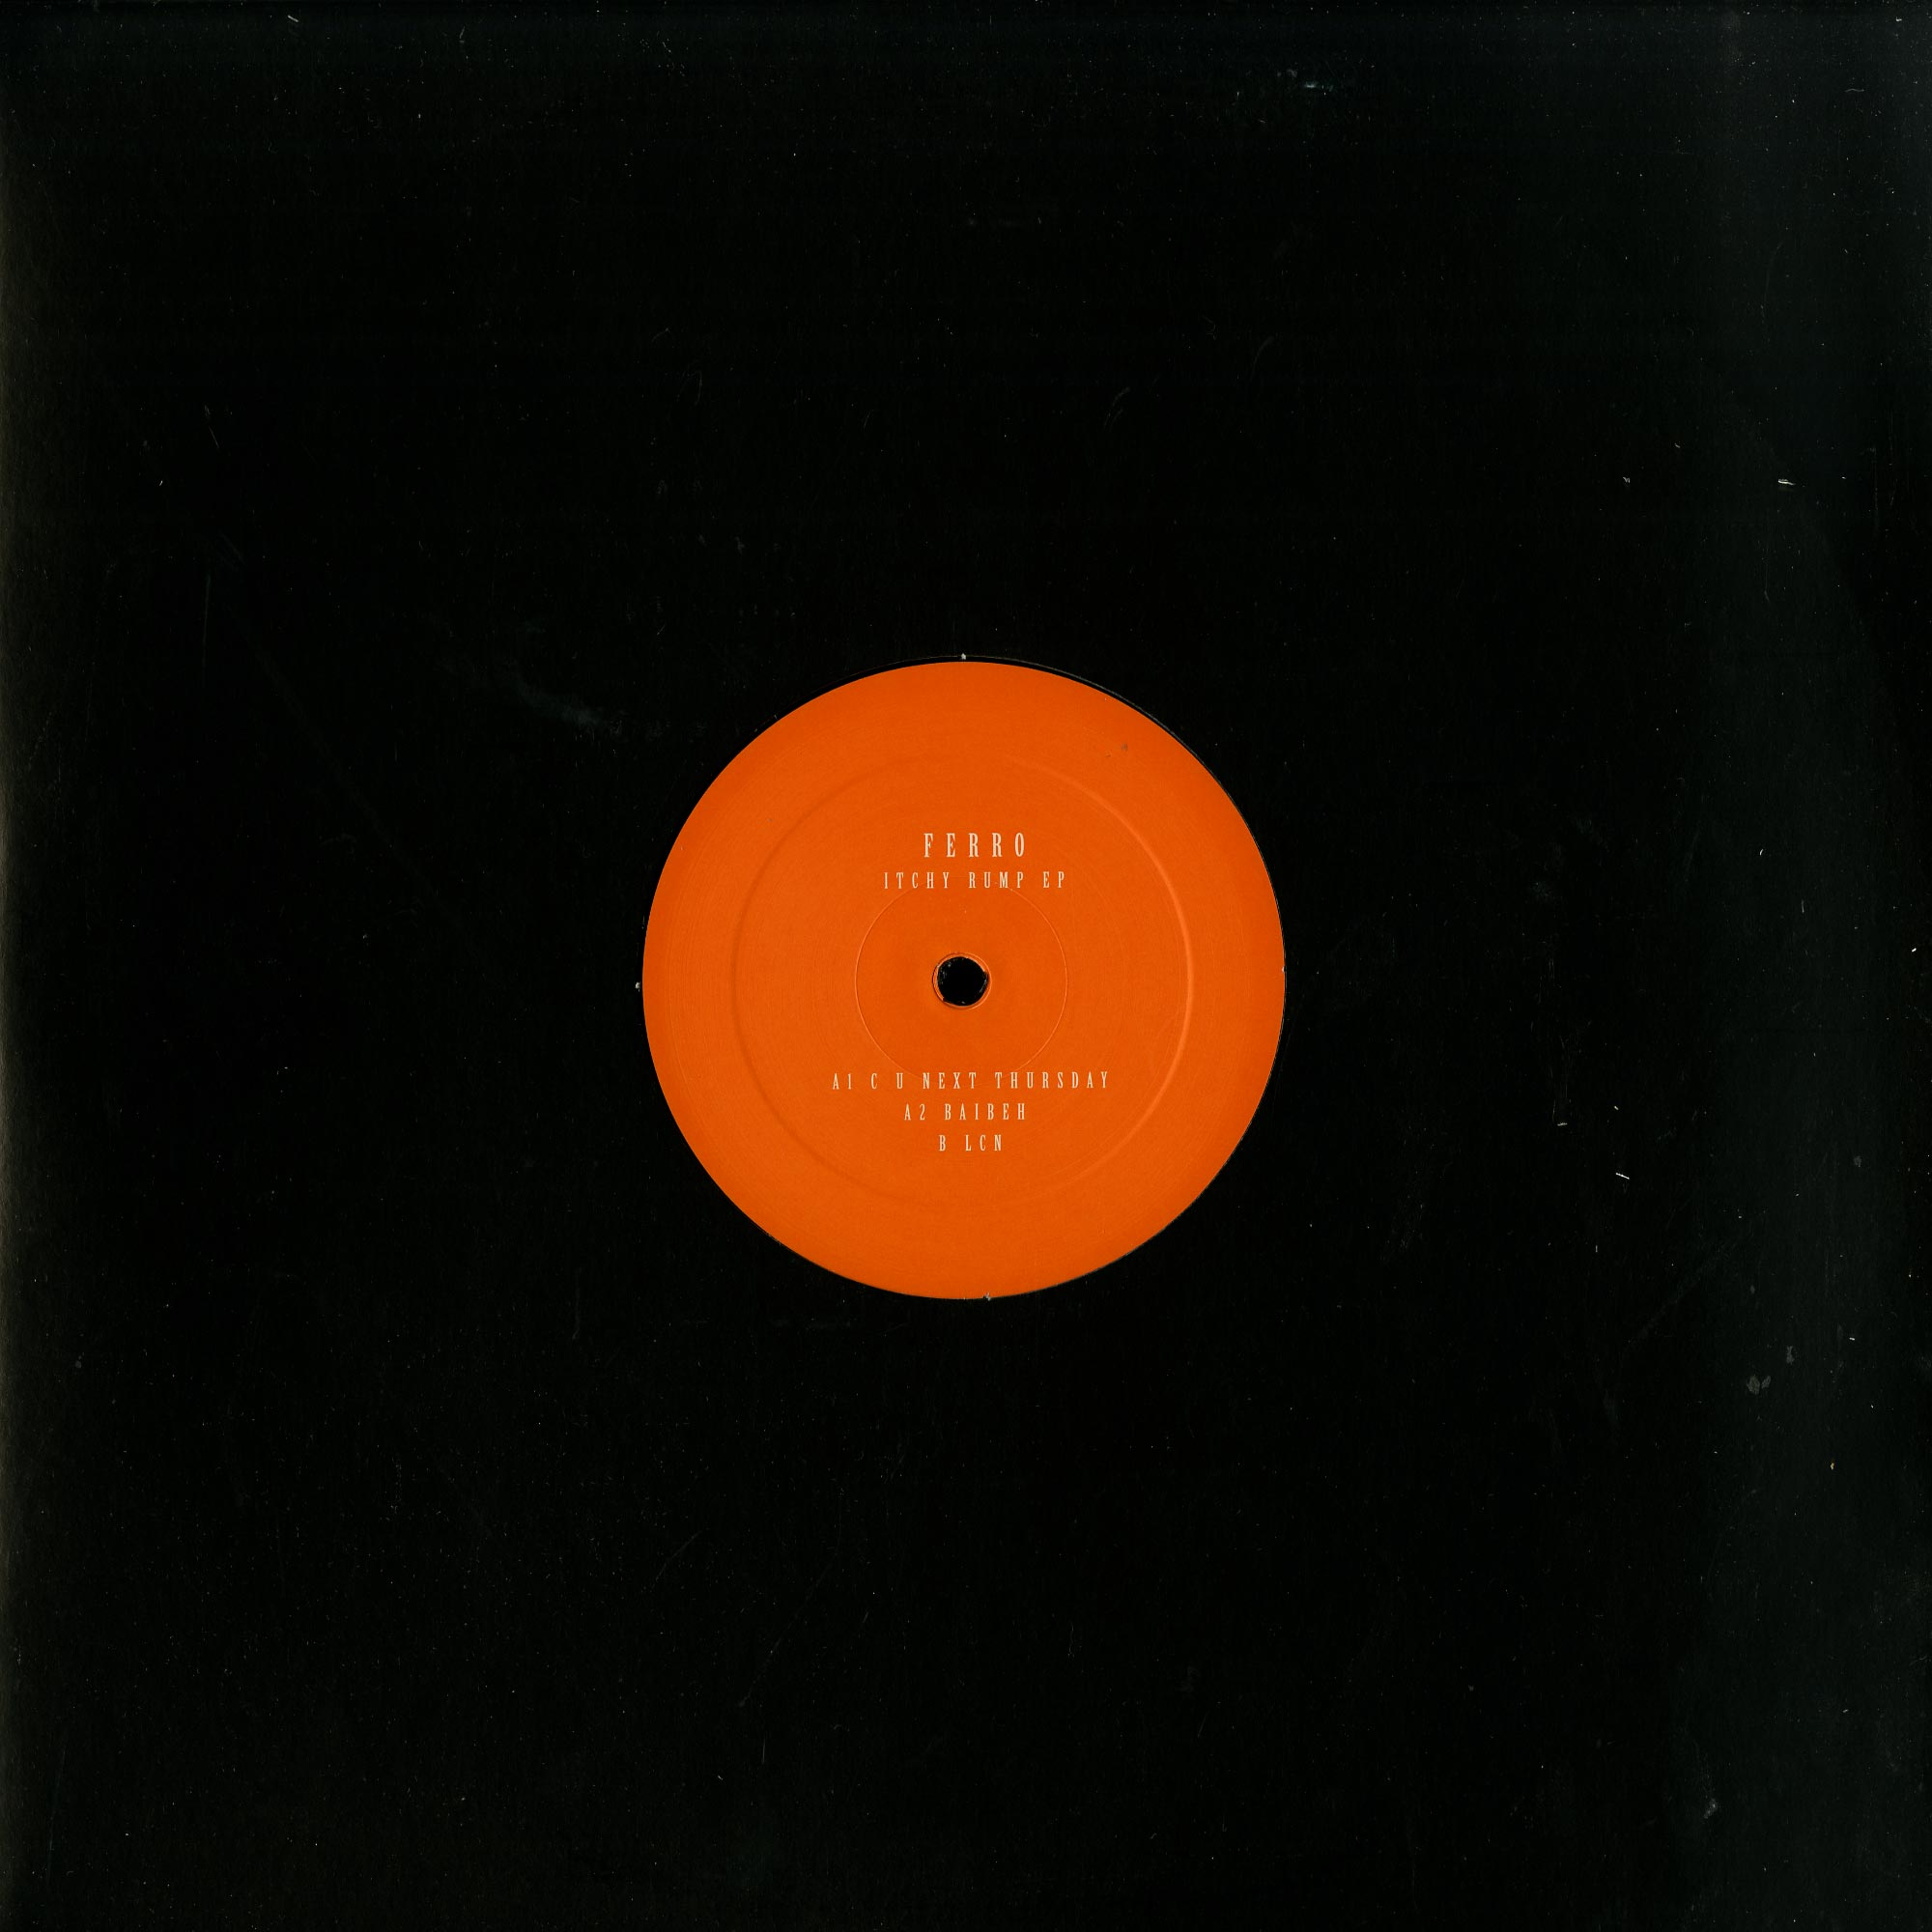 Ferro - ITCHY RUMP EP